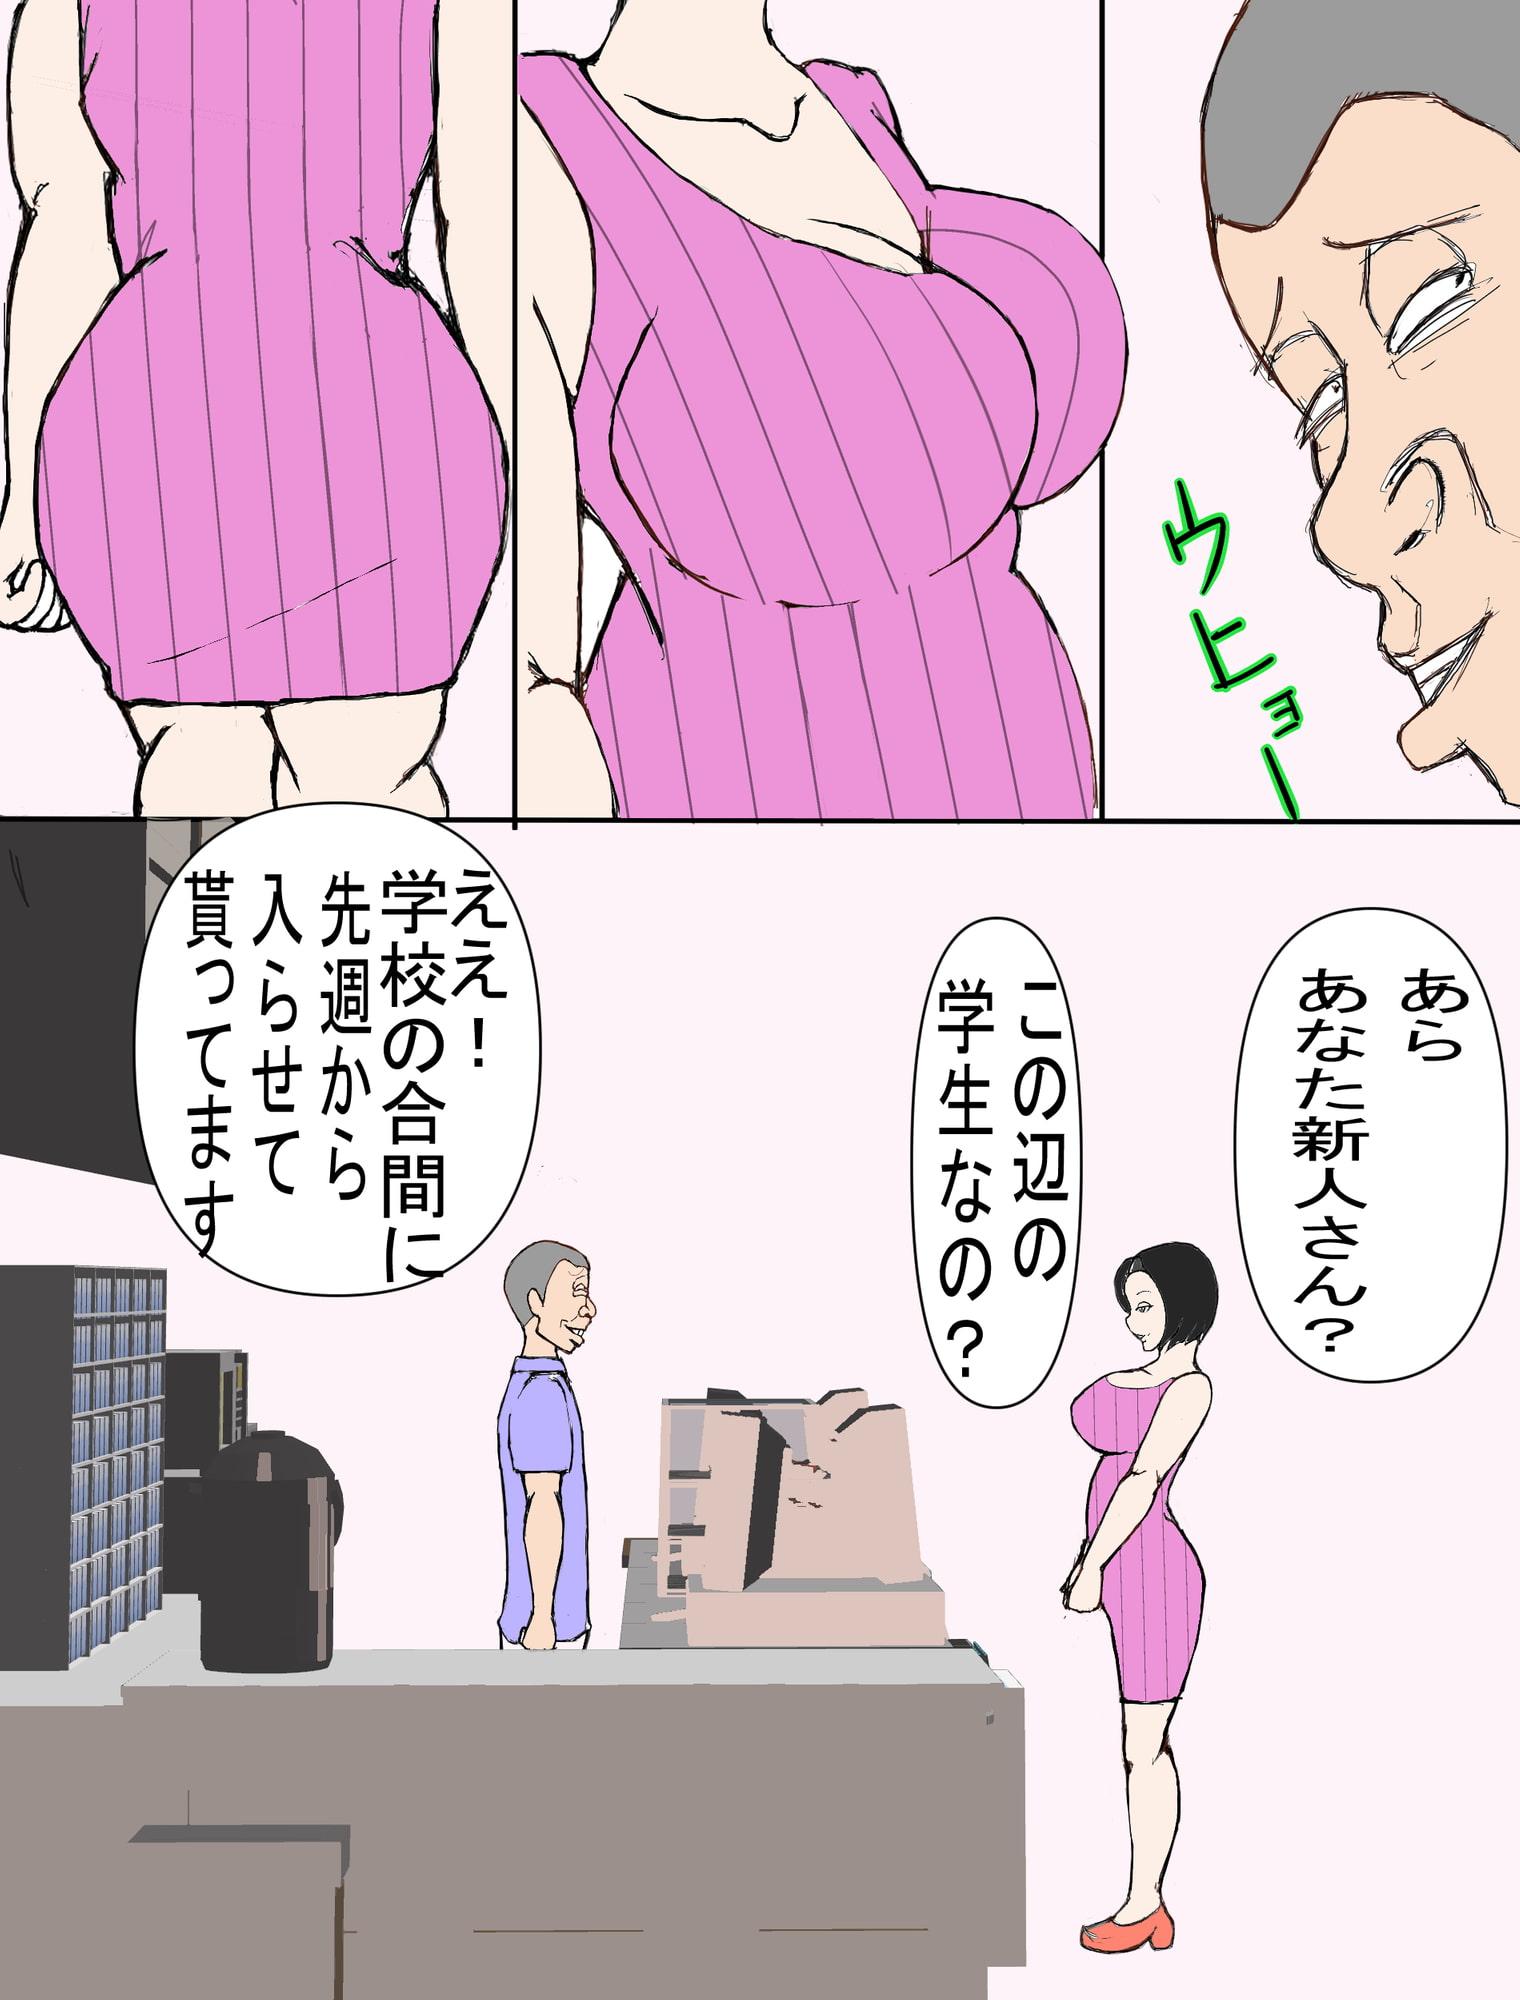 RJ321110 覗き魔をお仕置きsexしたら逆に調教された人妻 [20210329]